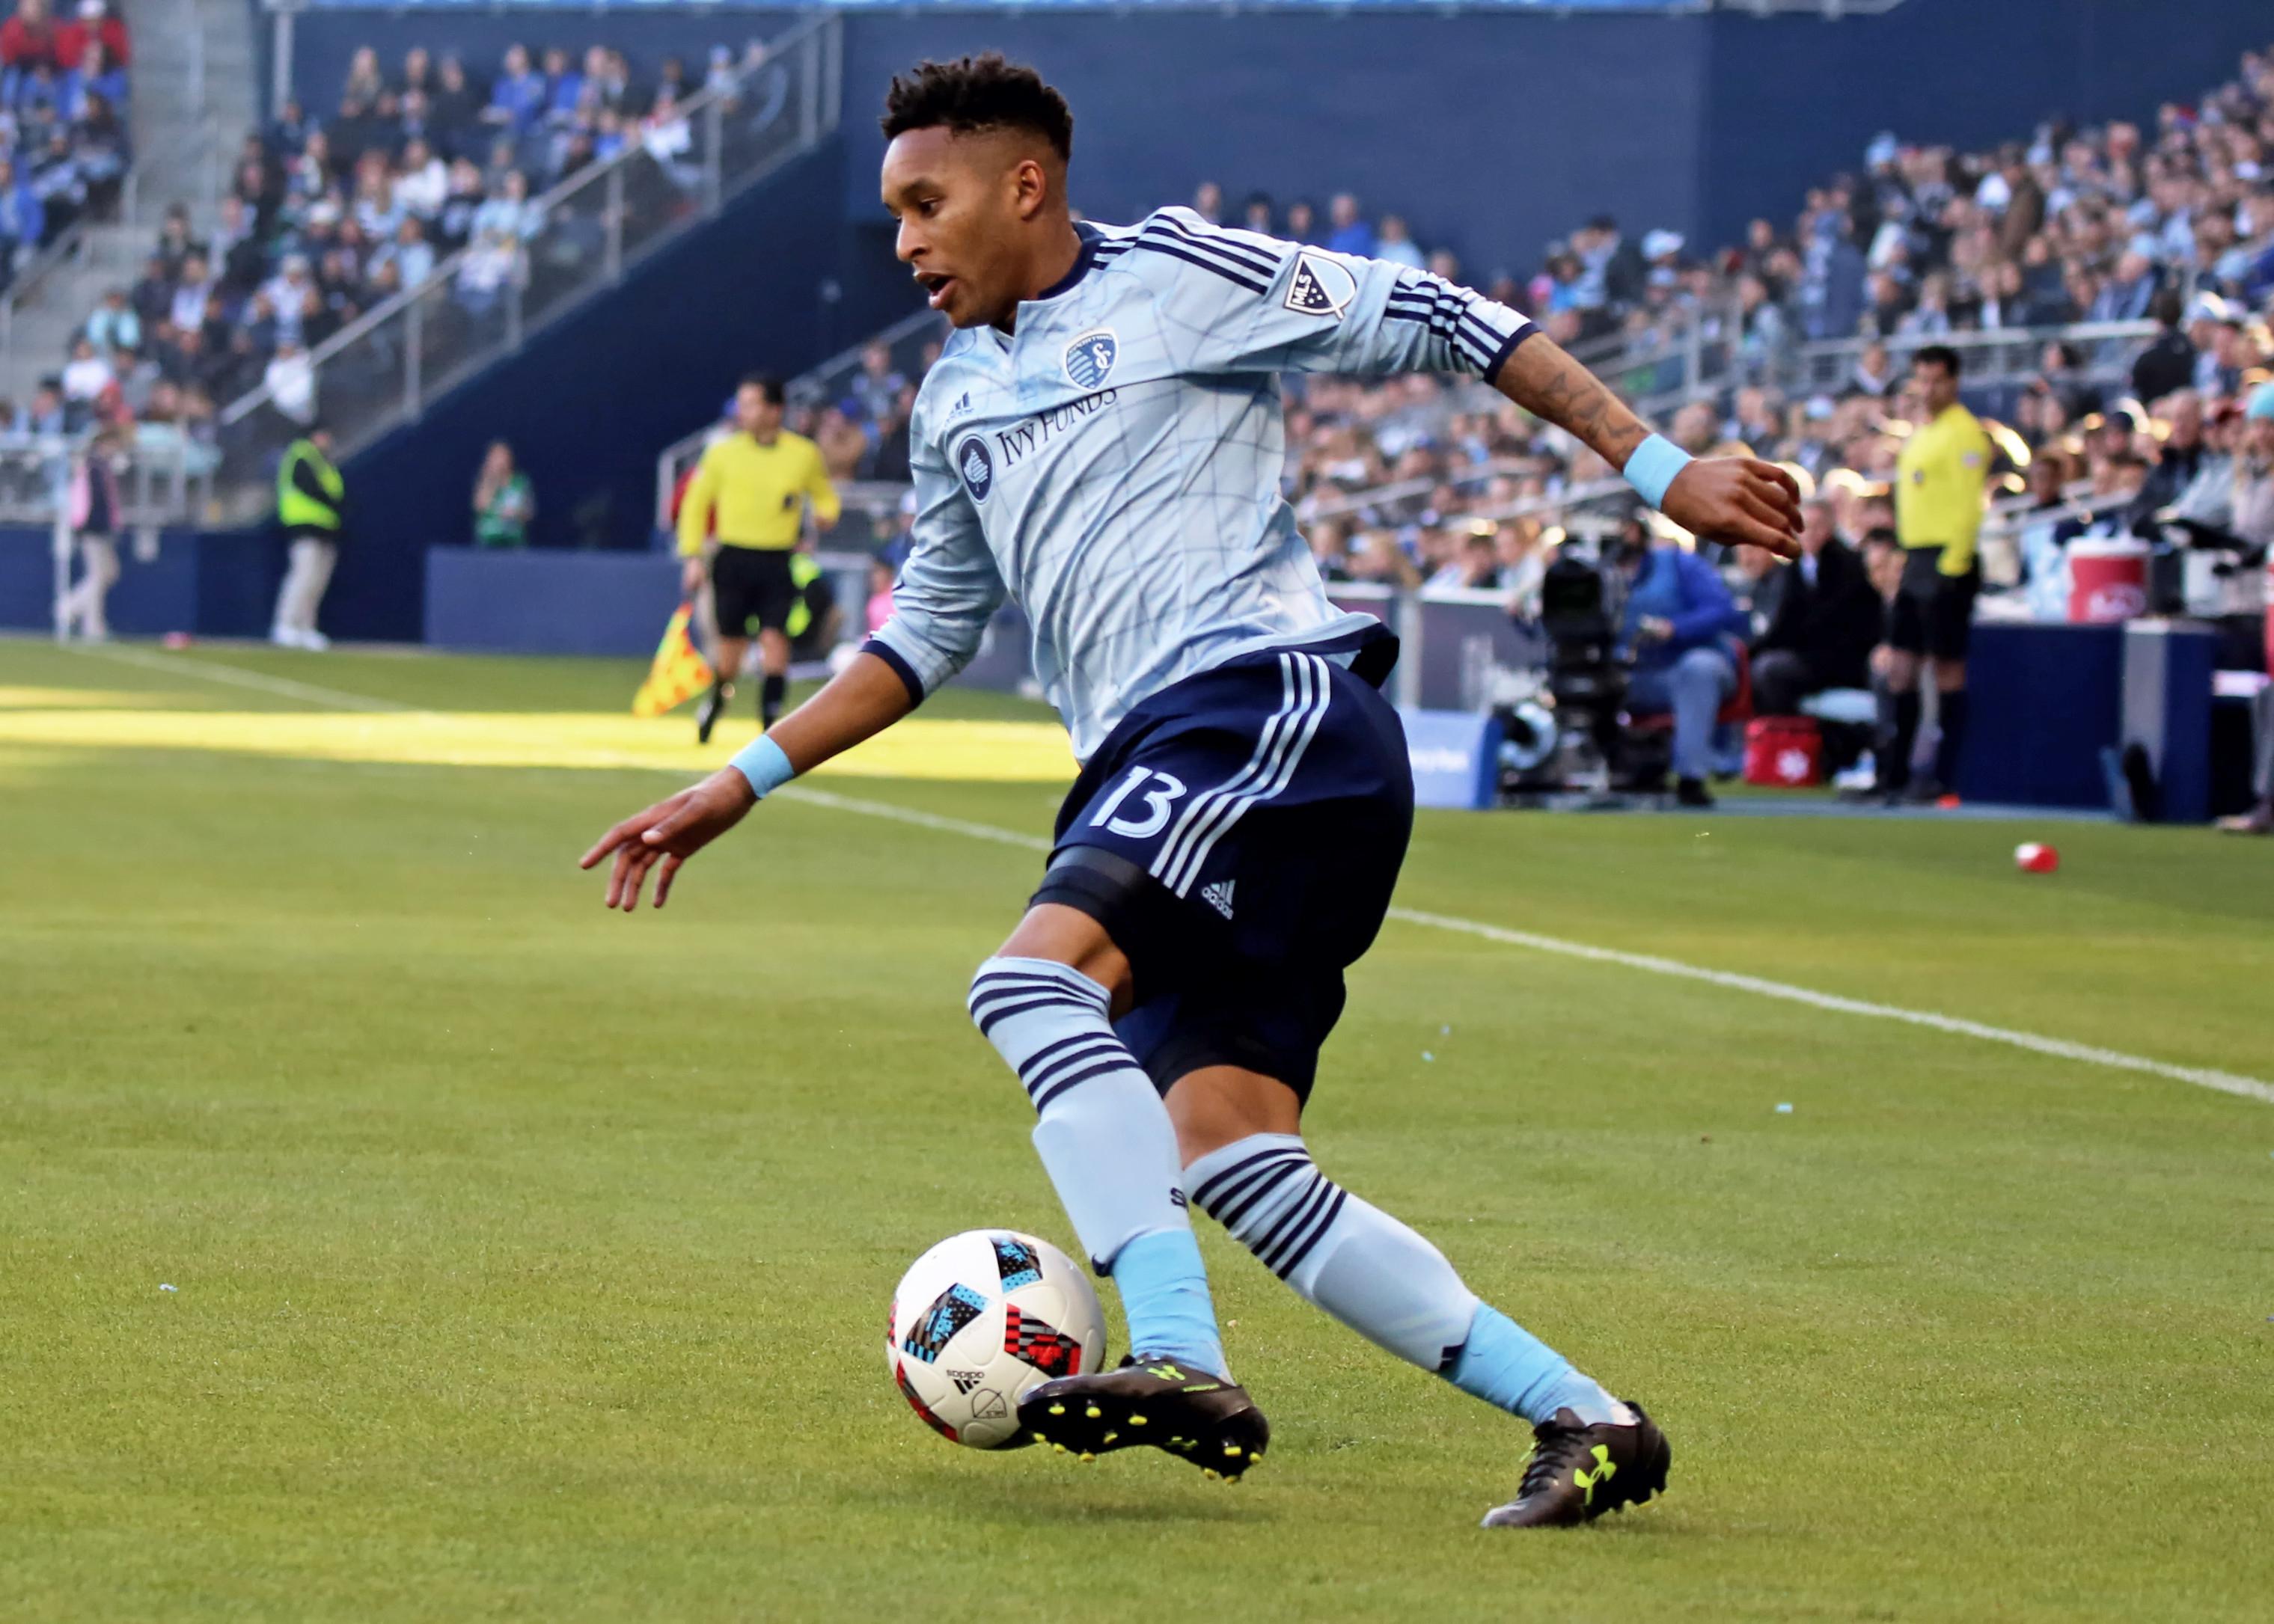 SOCCER: MAR 20 MLS - Toronto FC at Sporting KC